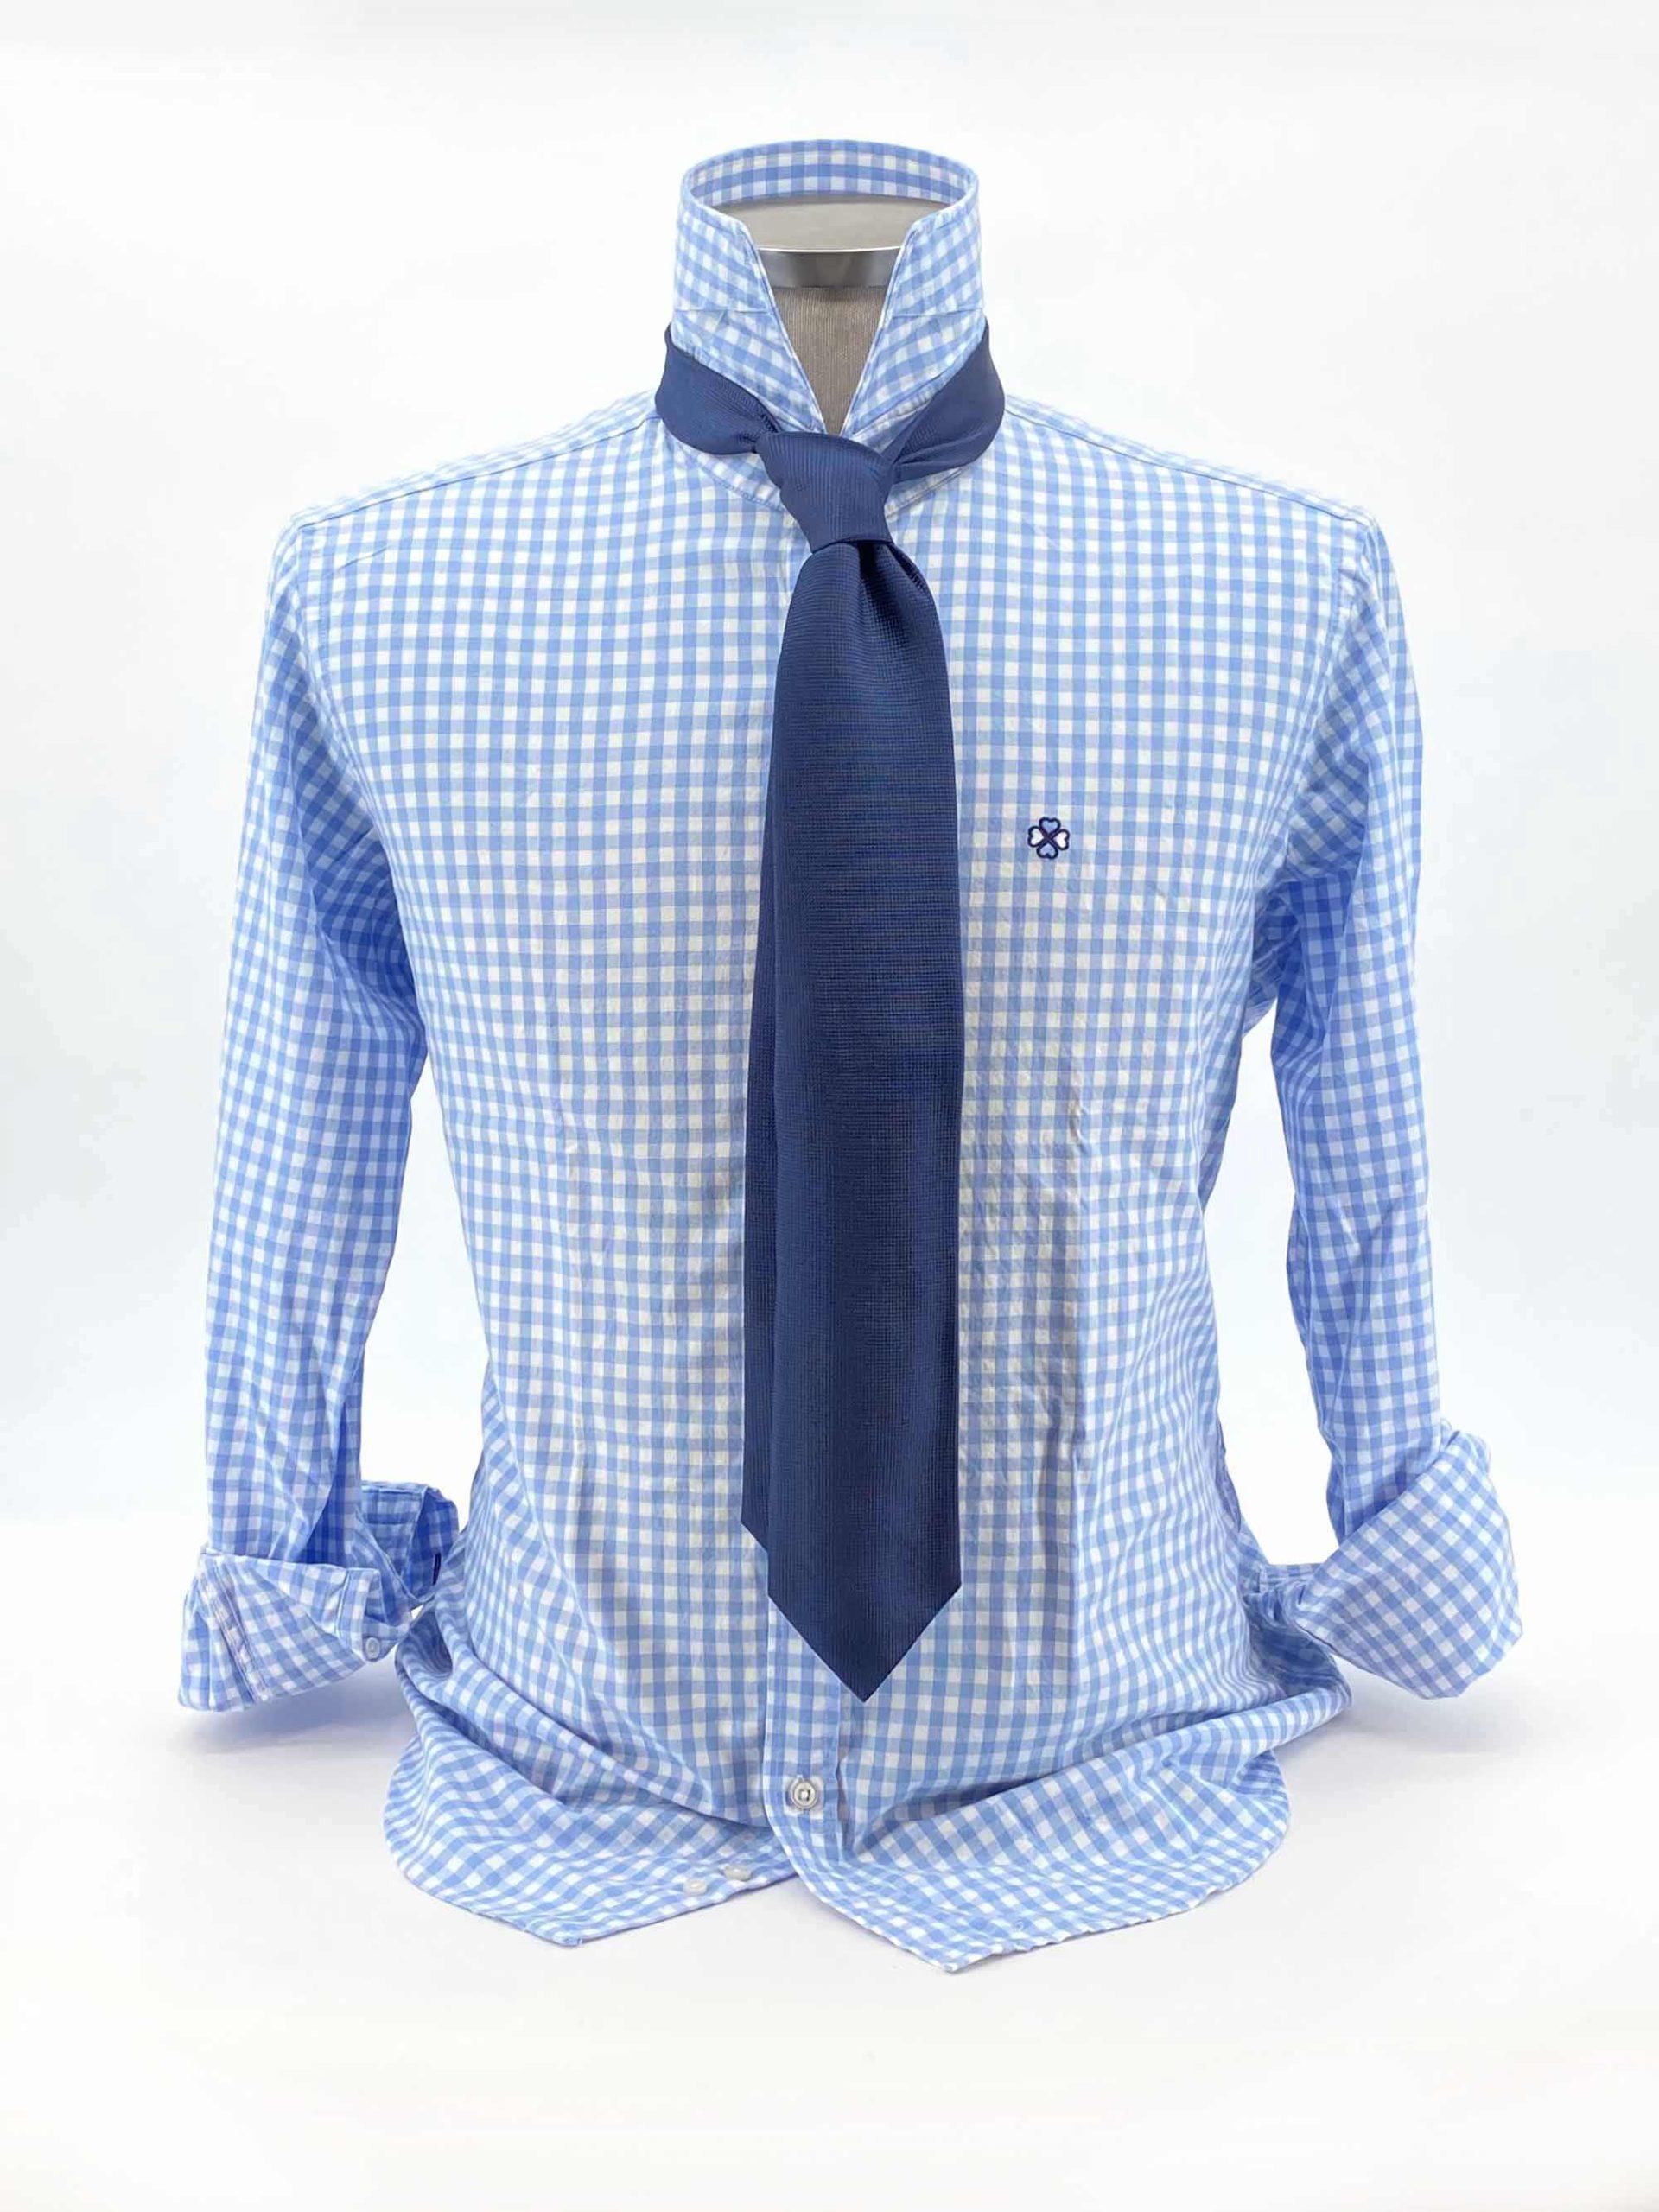 camisas buona fortuna comprar online camisas italianas exlusivas twill cuadros azules corbata azul